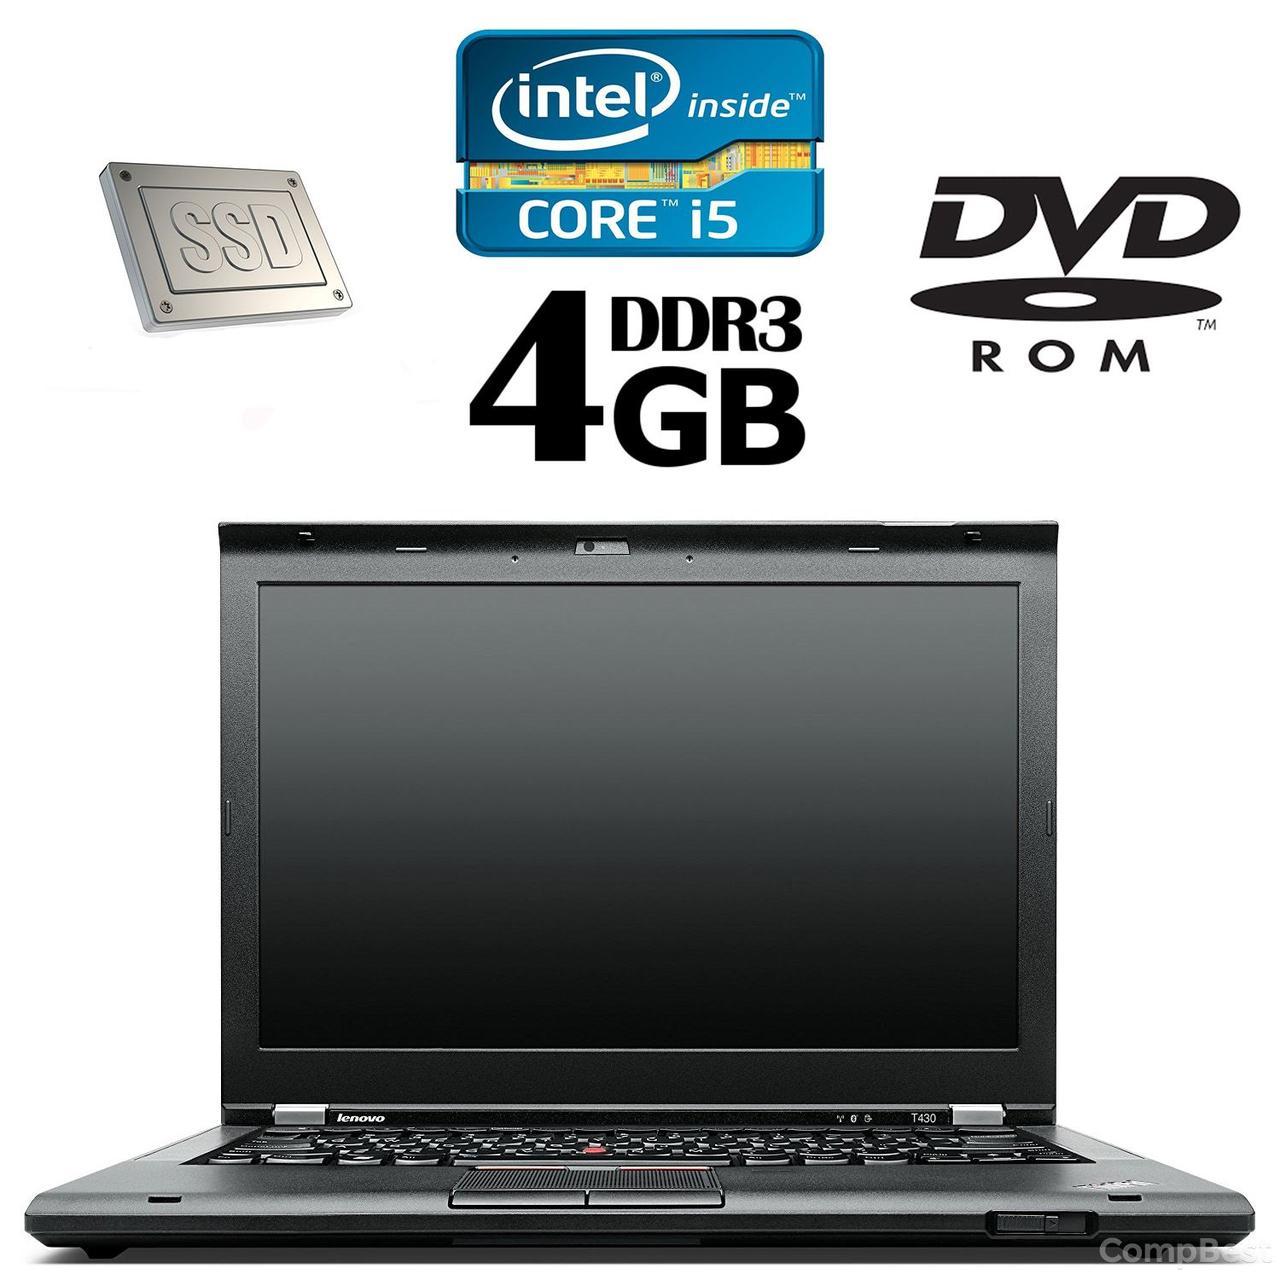 "Lenovo ThinkPad T430 / 14"" / Intel Core i5-3320M (2(4) ядра по 2.6-3.3GHz) / 4 GB DDR3 / 128 SSD / Intel HD Graphics 4000 / DVD-RW"